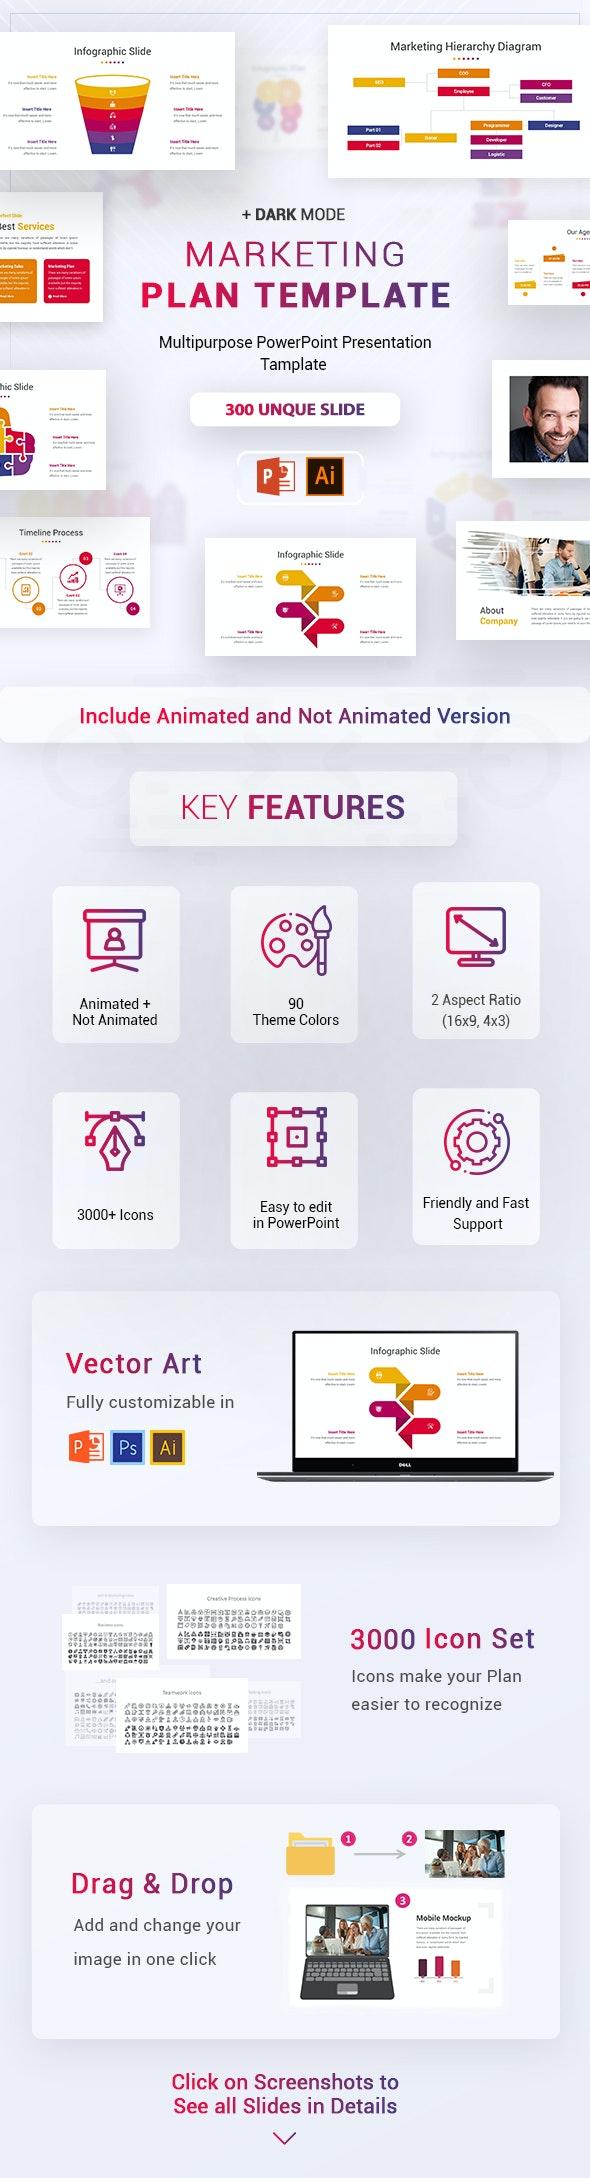 Marketing Plan Template - Business PowerPoint Templates